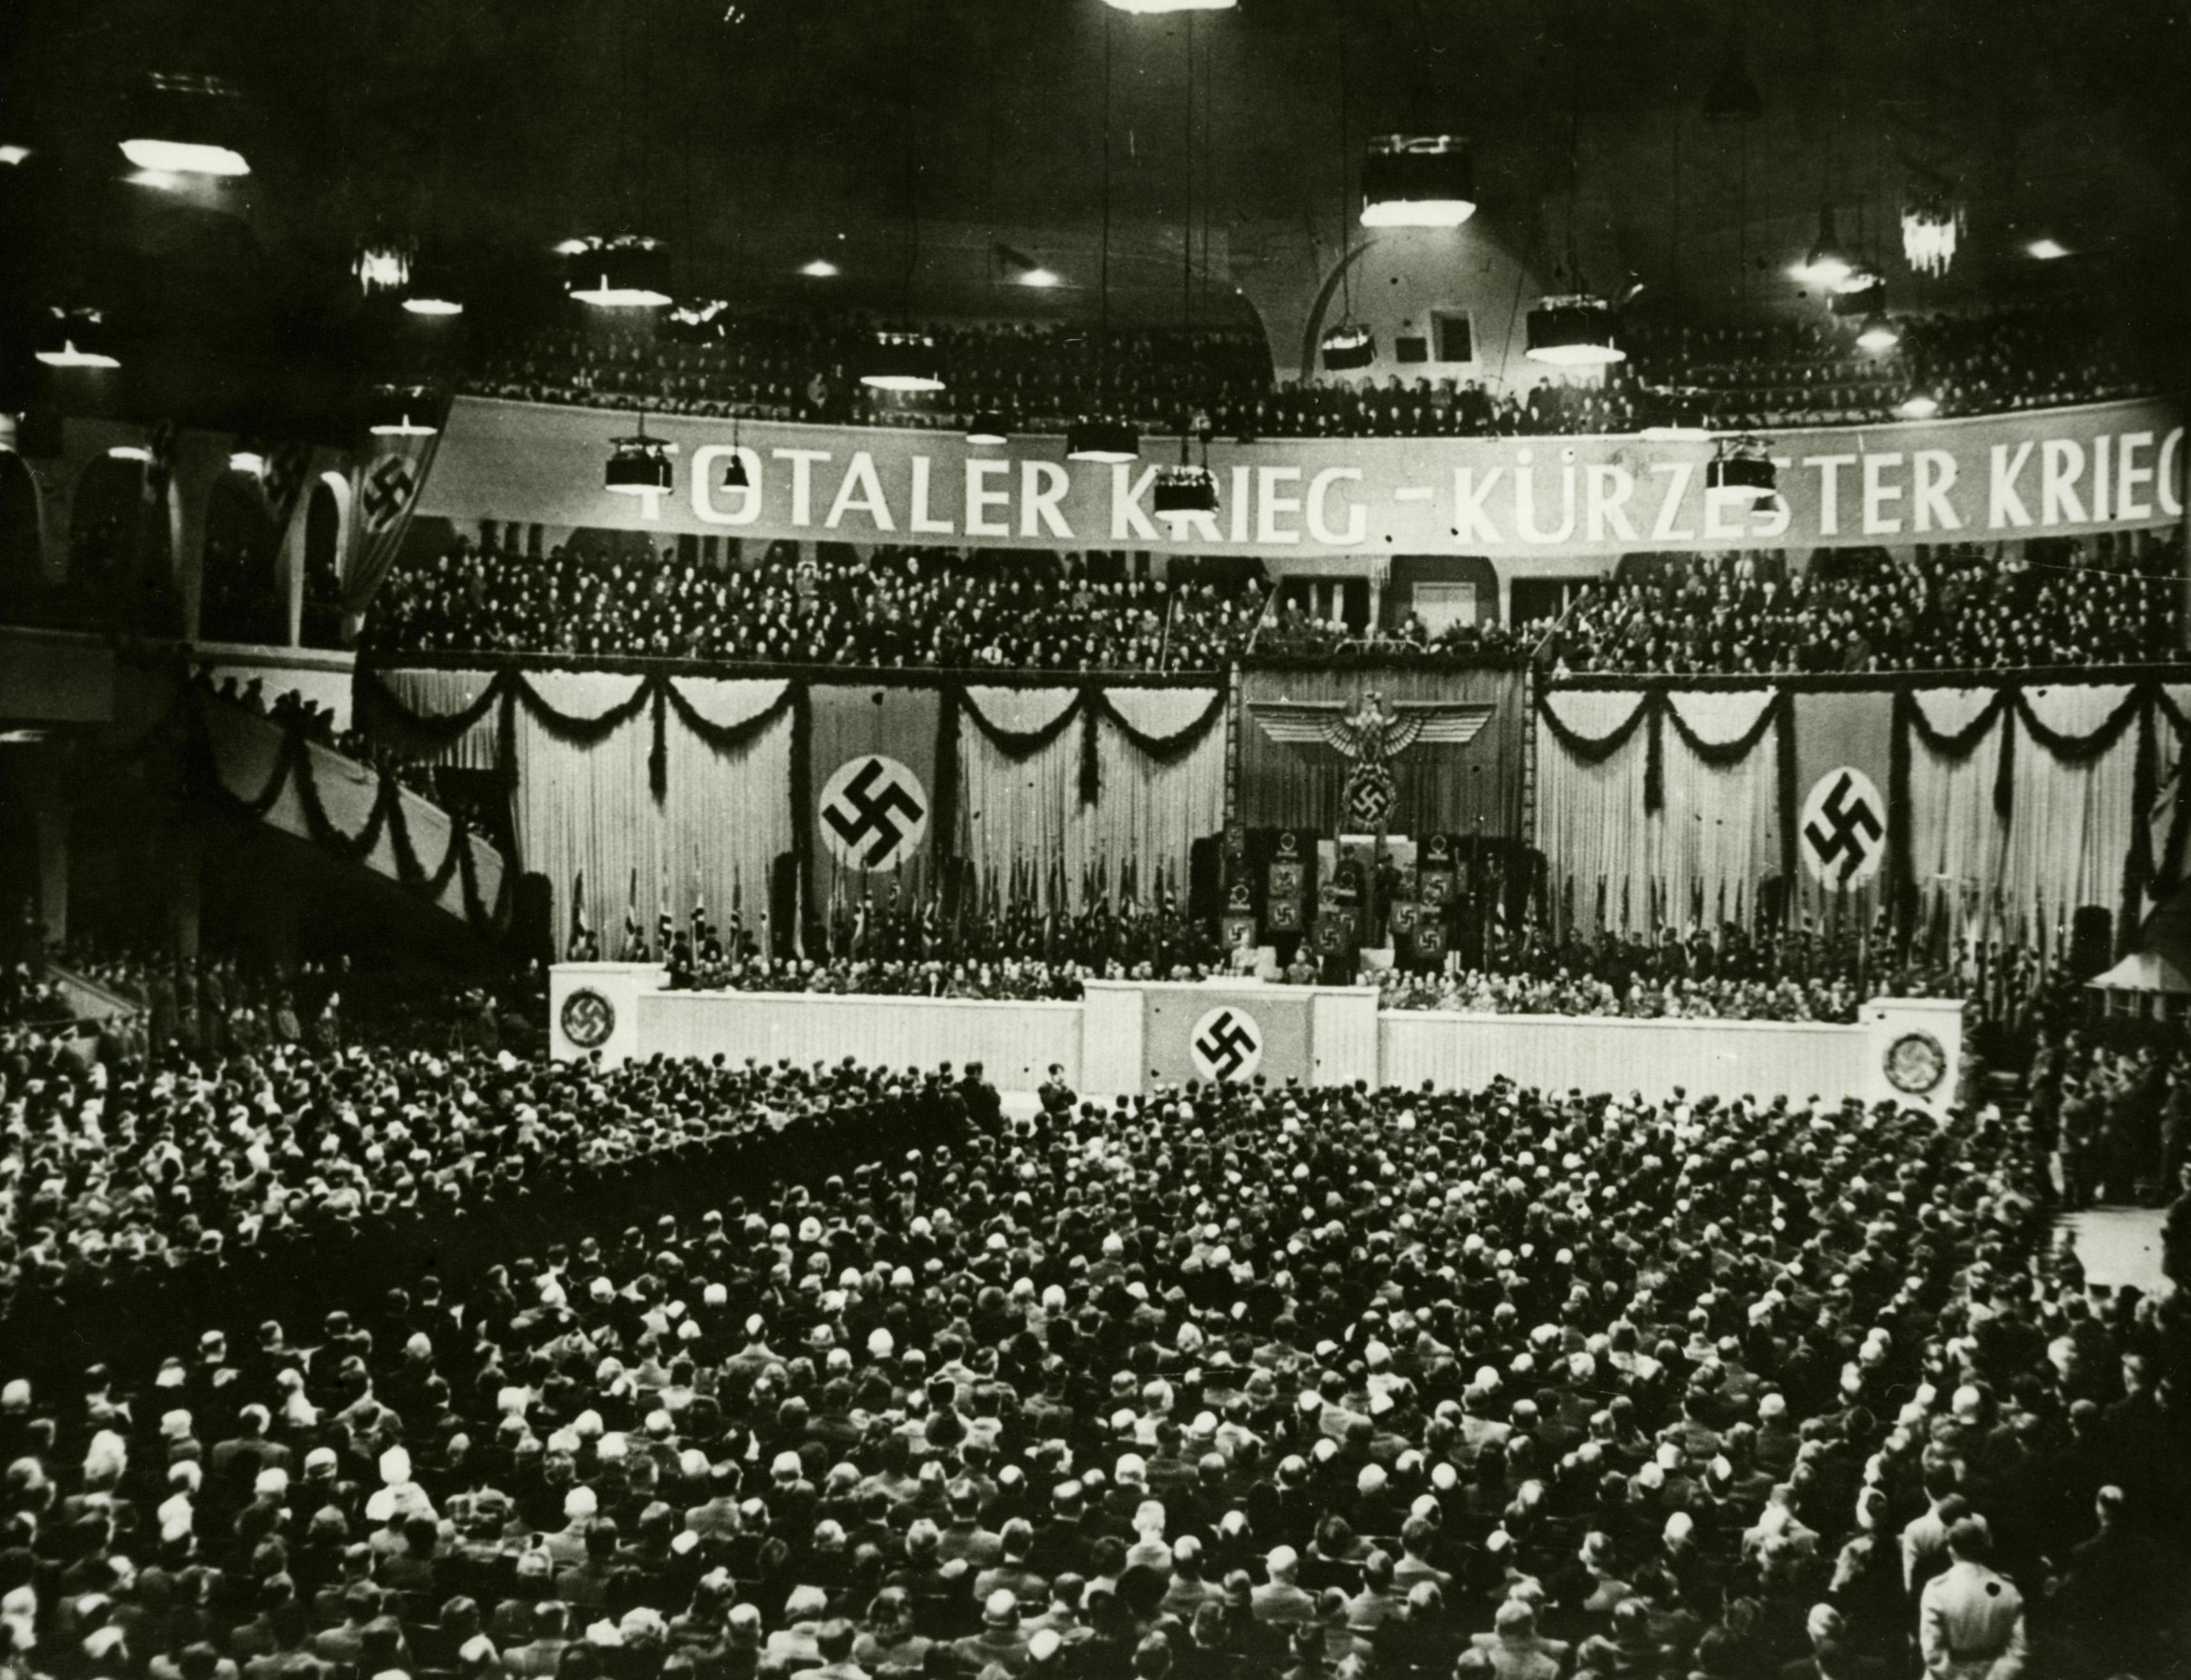 Goebbels Rede Totaler Krieg